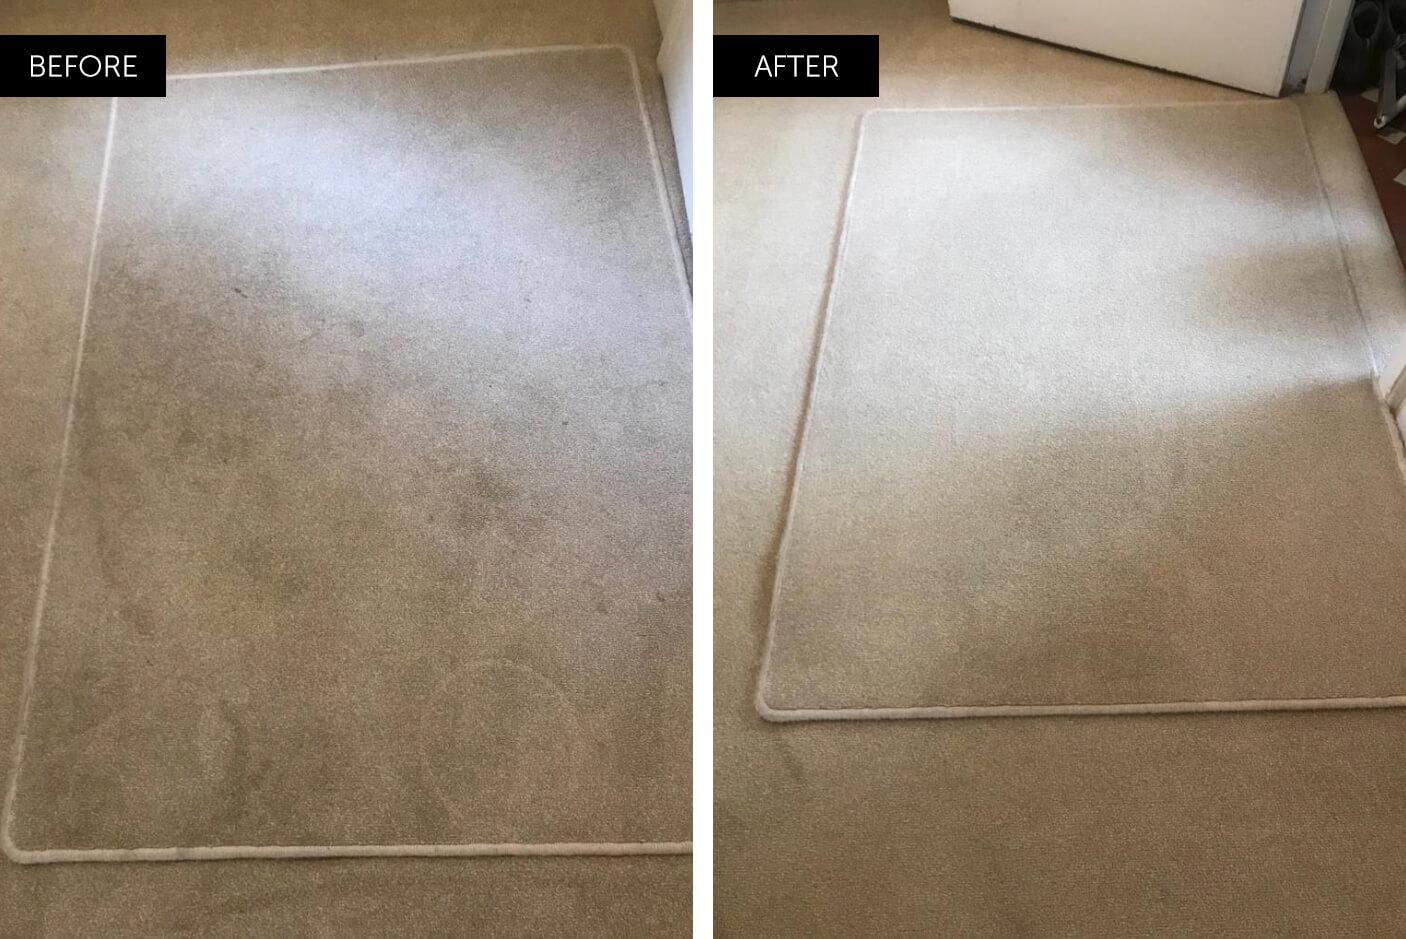 door mat professionally cleaned